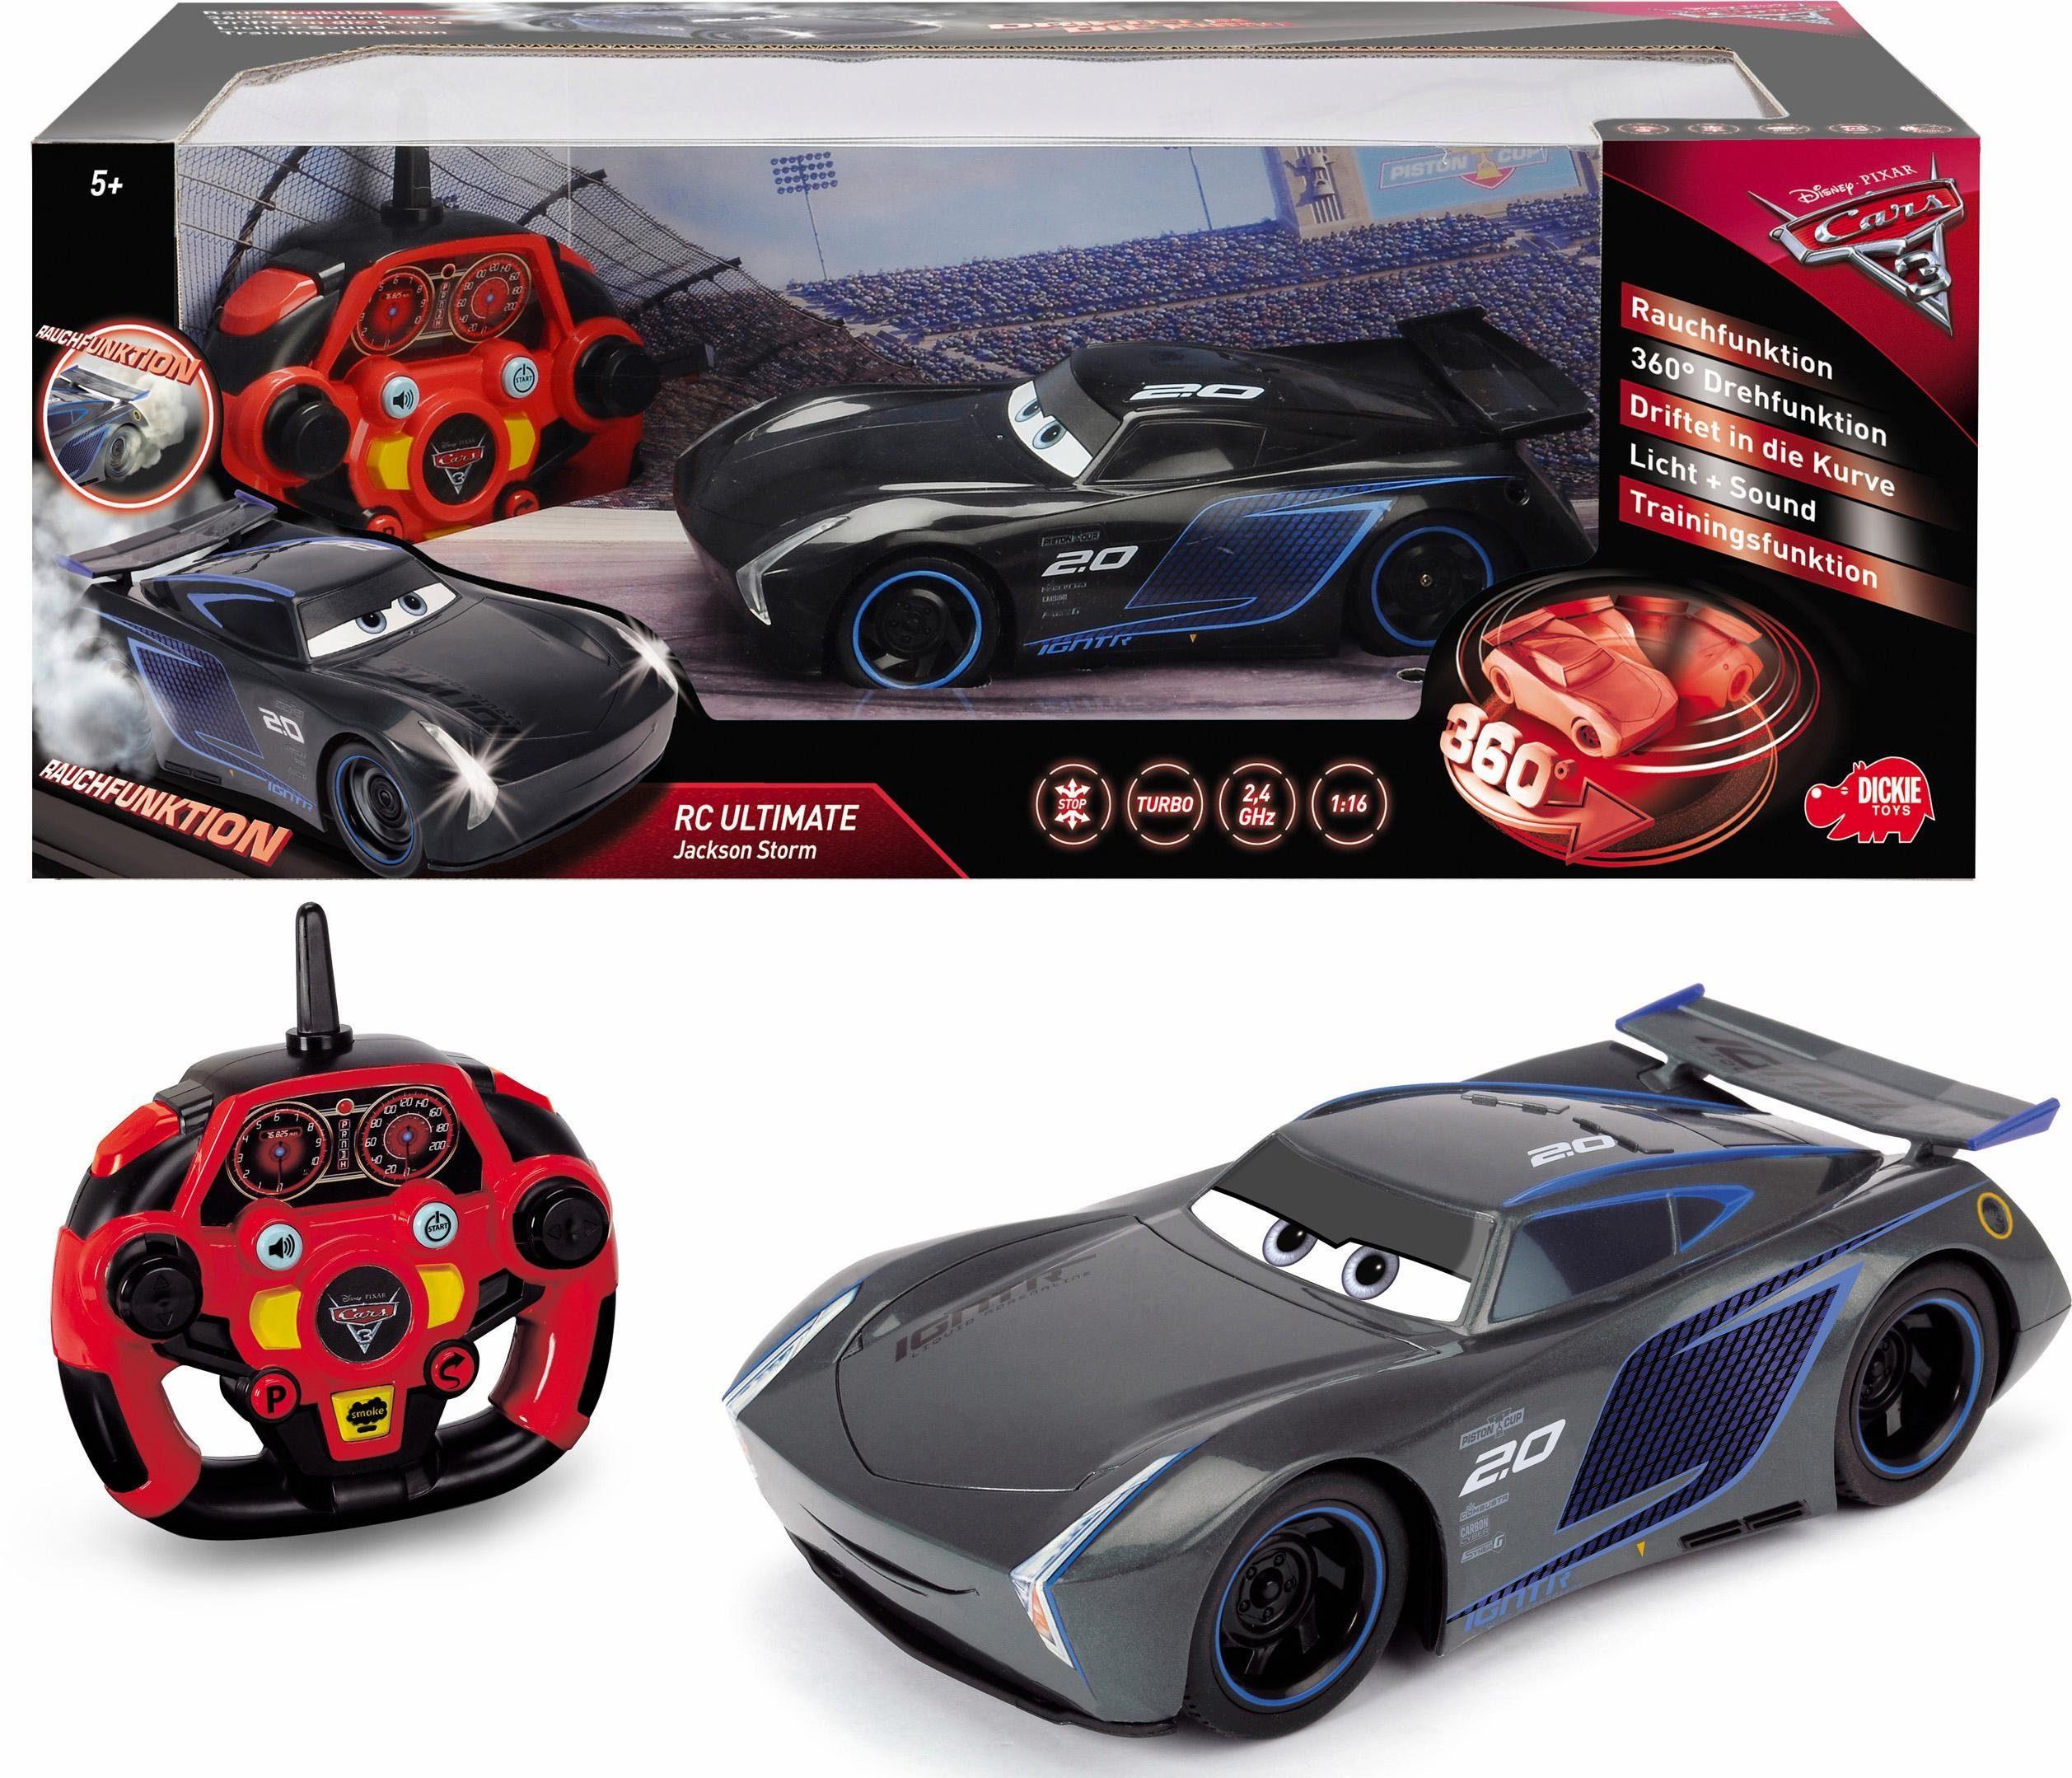 Dickie Toys RC Fahrzeug mit Rauchfunktion, »Disney Pixar Cars 3, Ultimate Jackson Storm, 2,4 GHz«